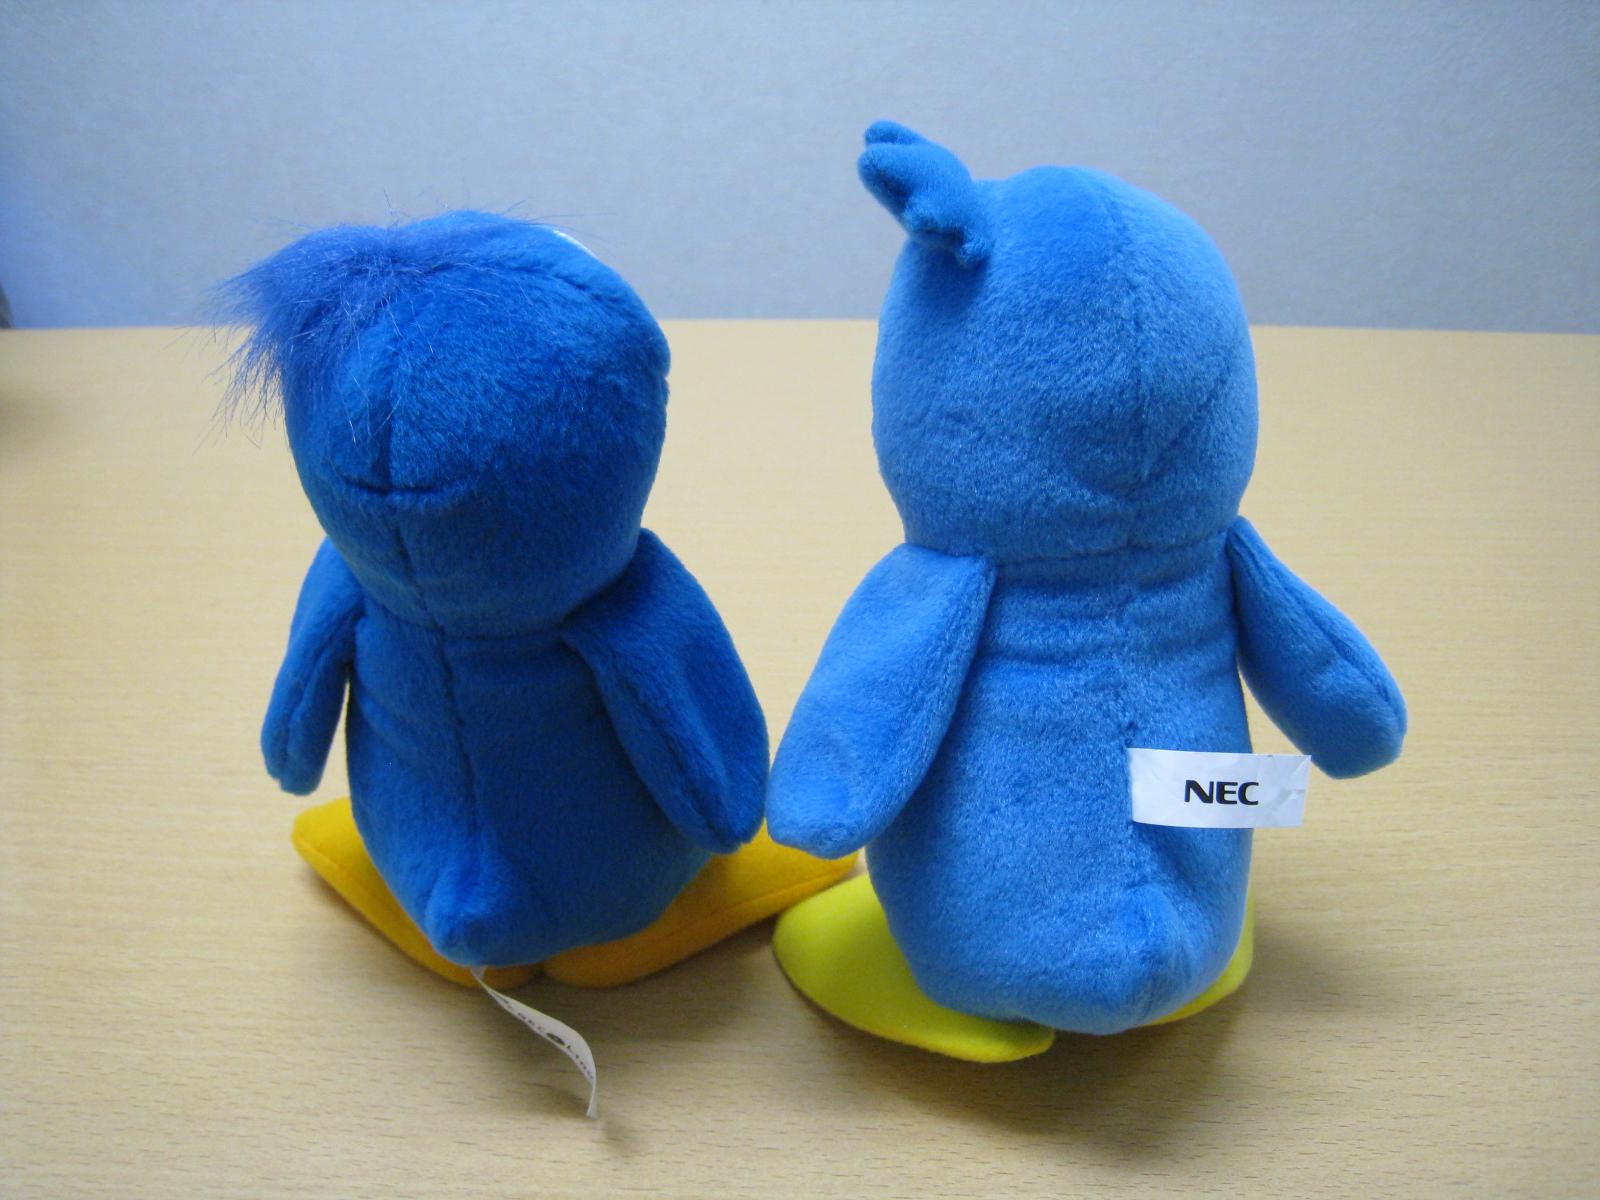 NECの青いペンギン